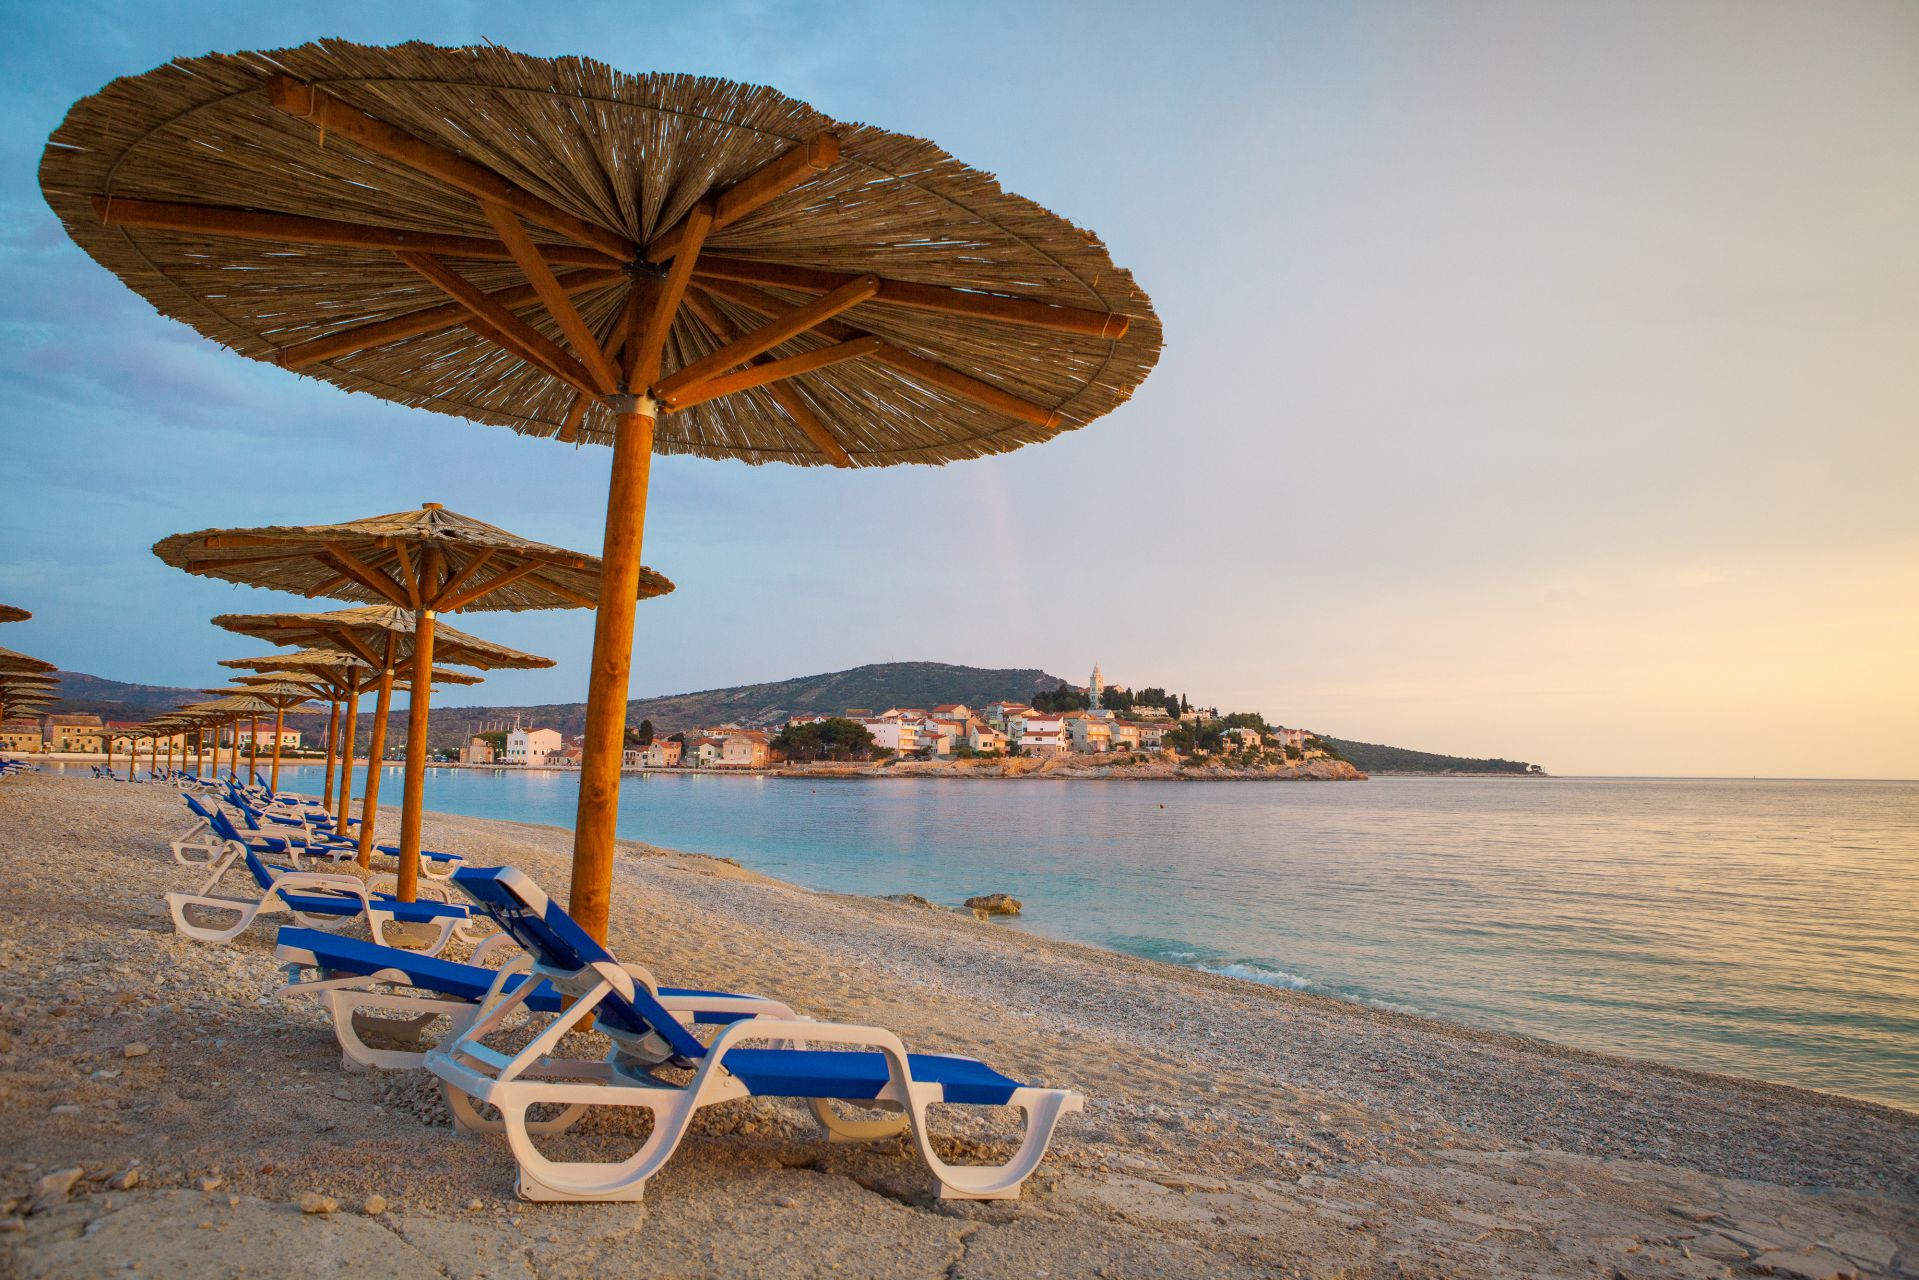 beach 07 14638501600 o 1 - Zora Hotel